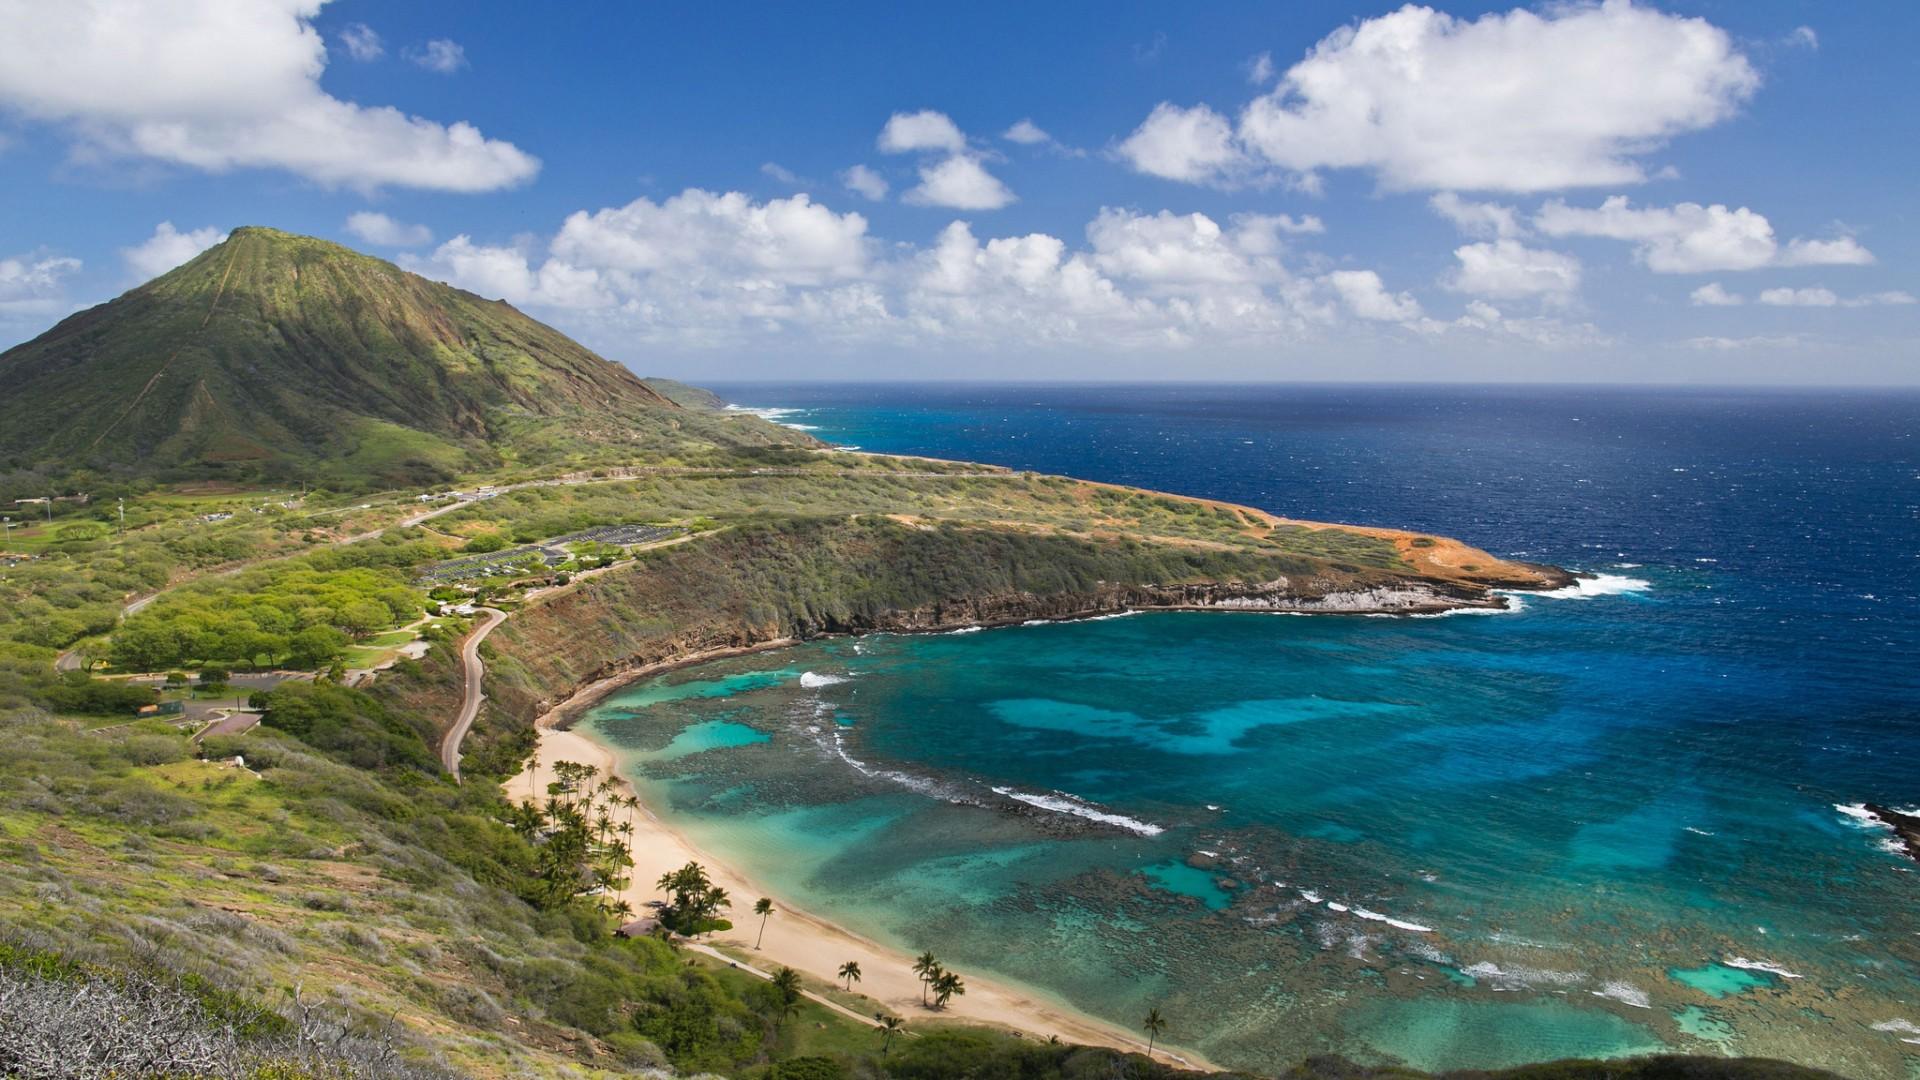 Download Beautiful Hawaii Island Photography HD Wallpaper Search more 1920x1080